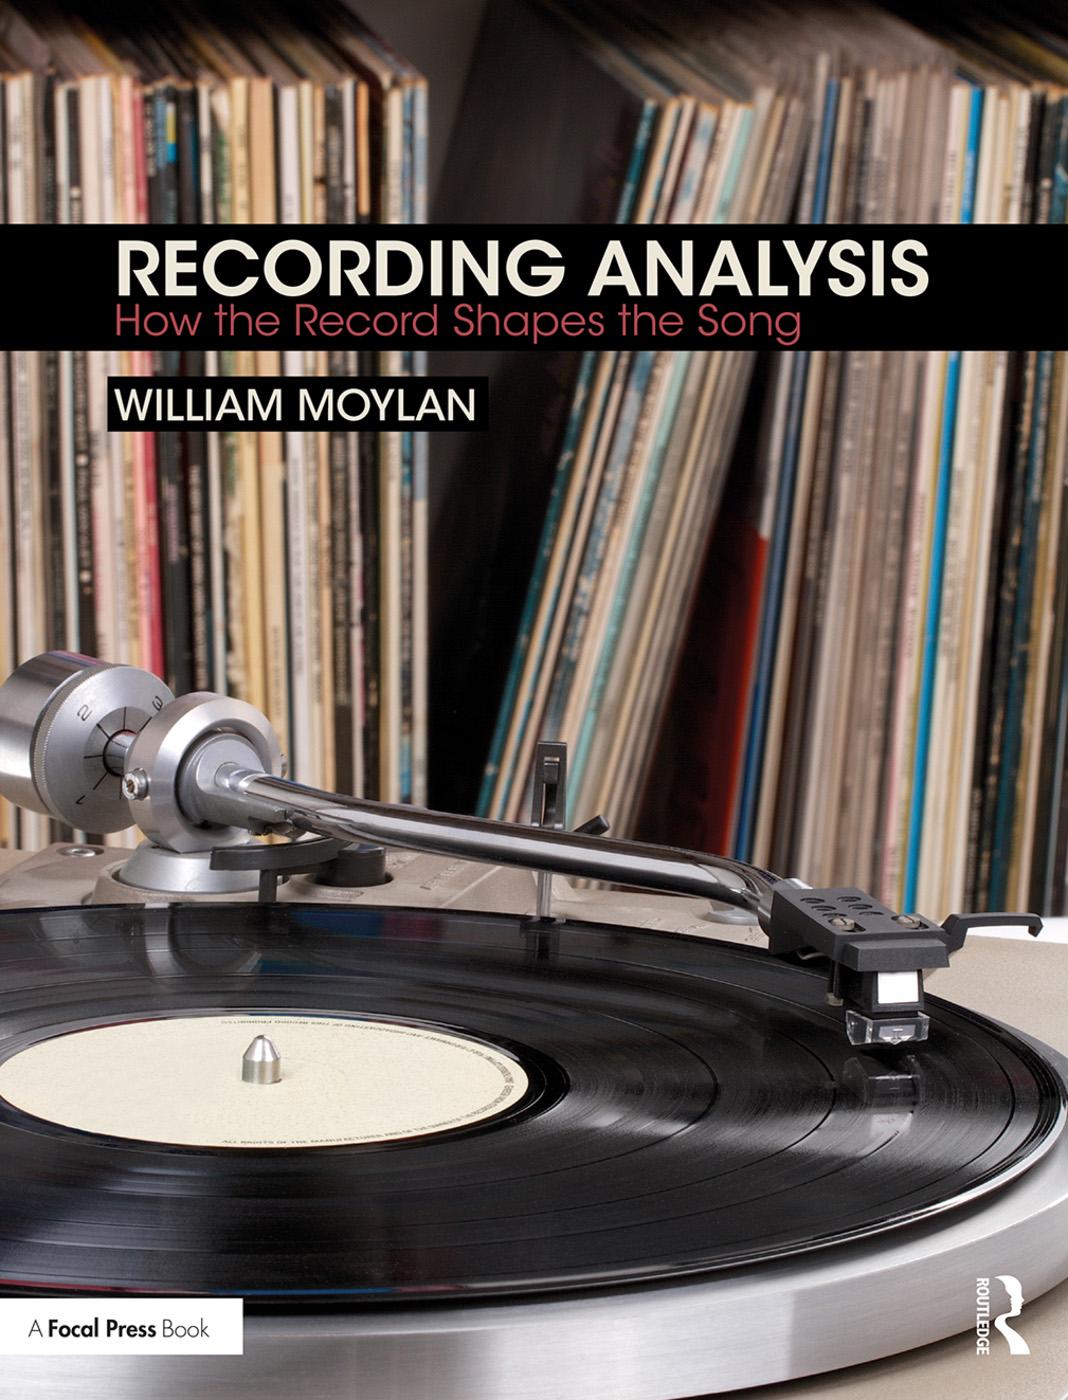 Recording Analysis